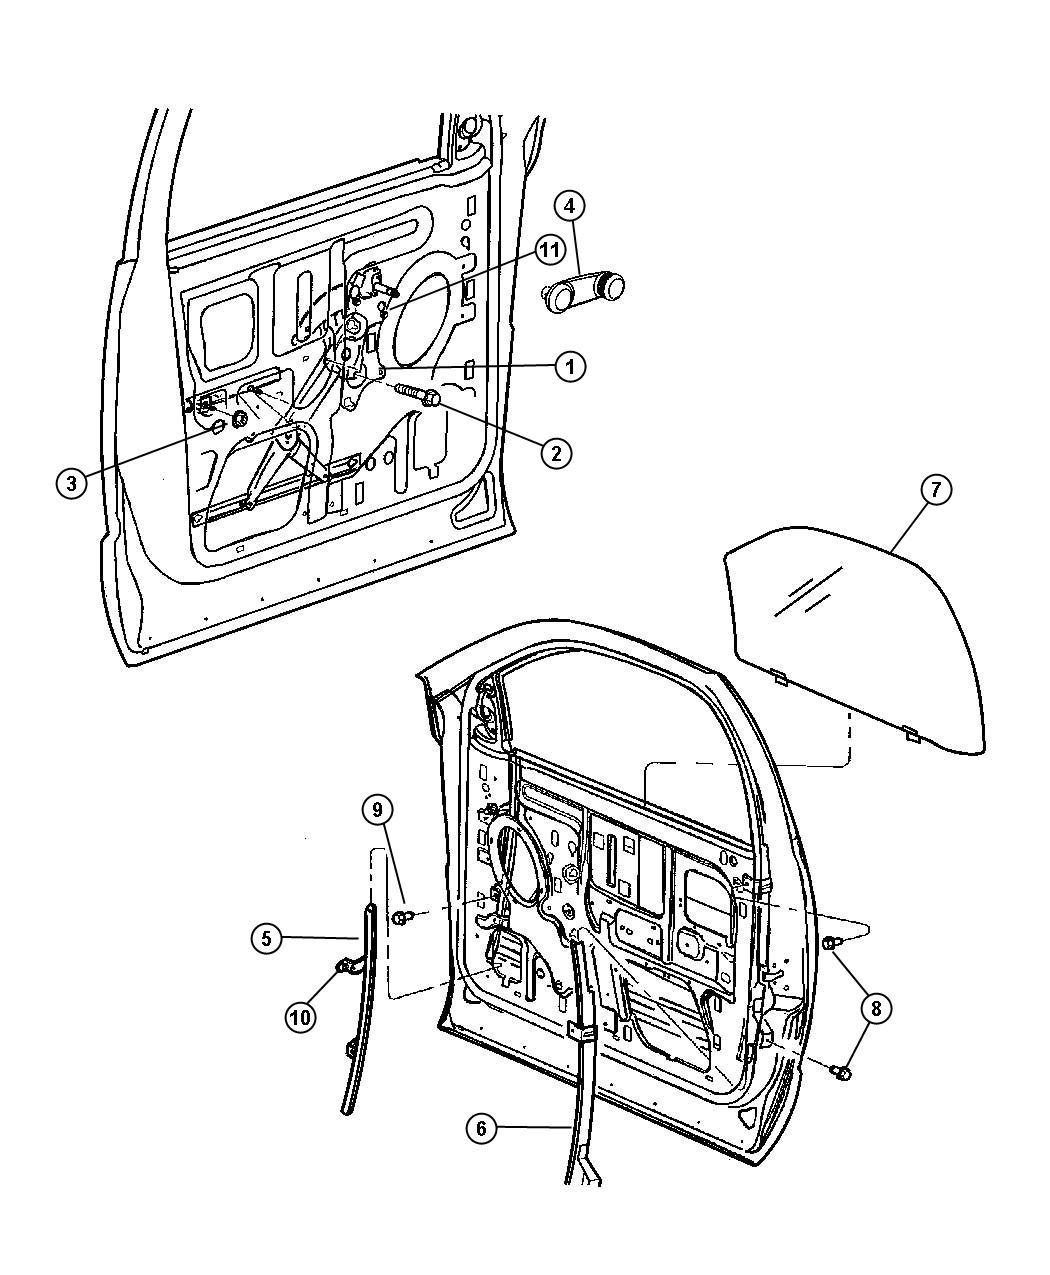 Dodge Ram 1500 Handle. Window regulator. Used for: right